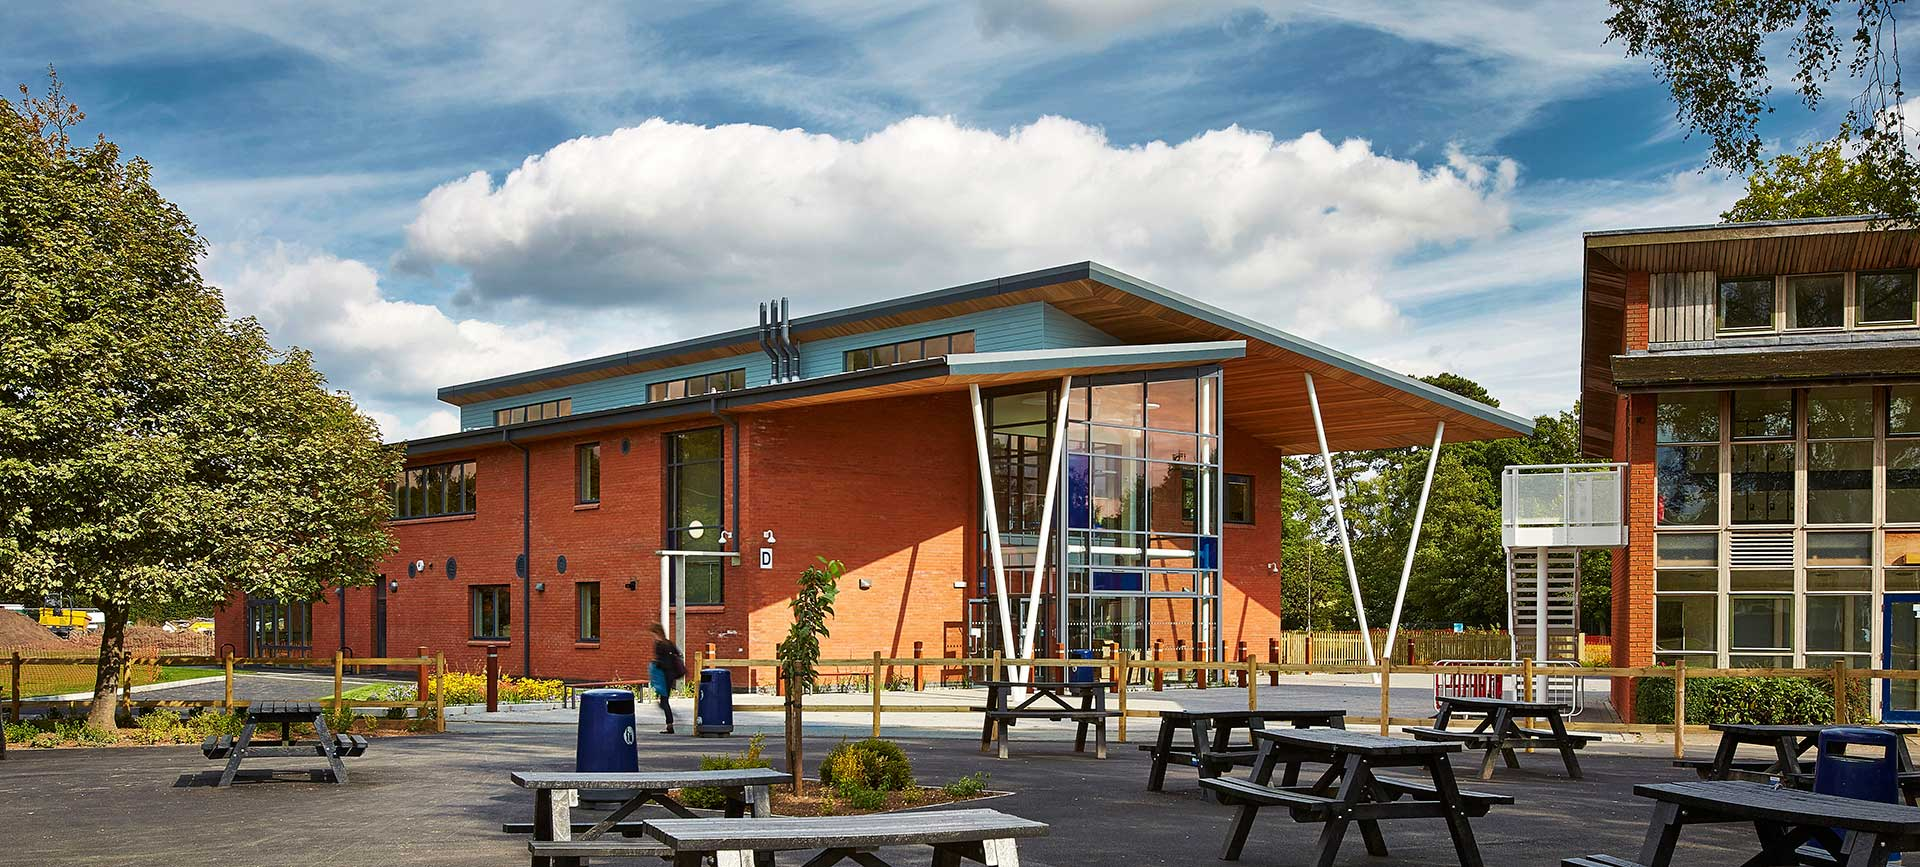 Head's Welcome & Blogs - The Bewdley School